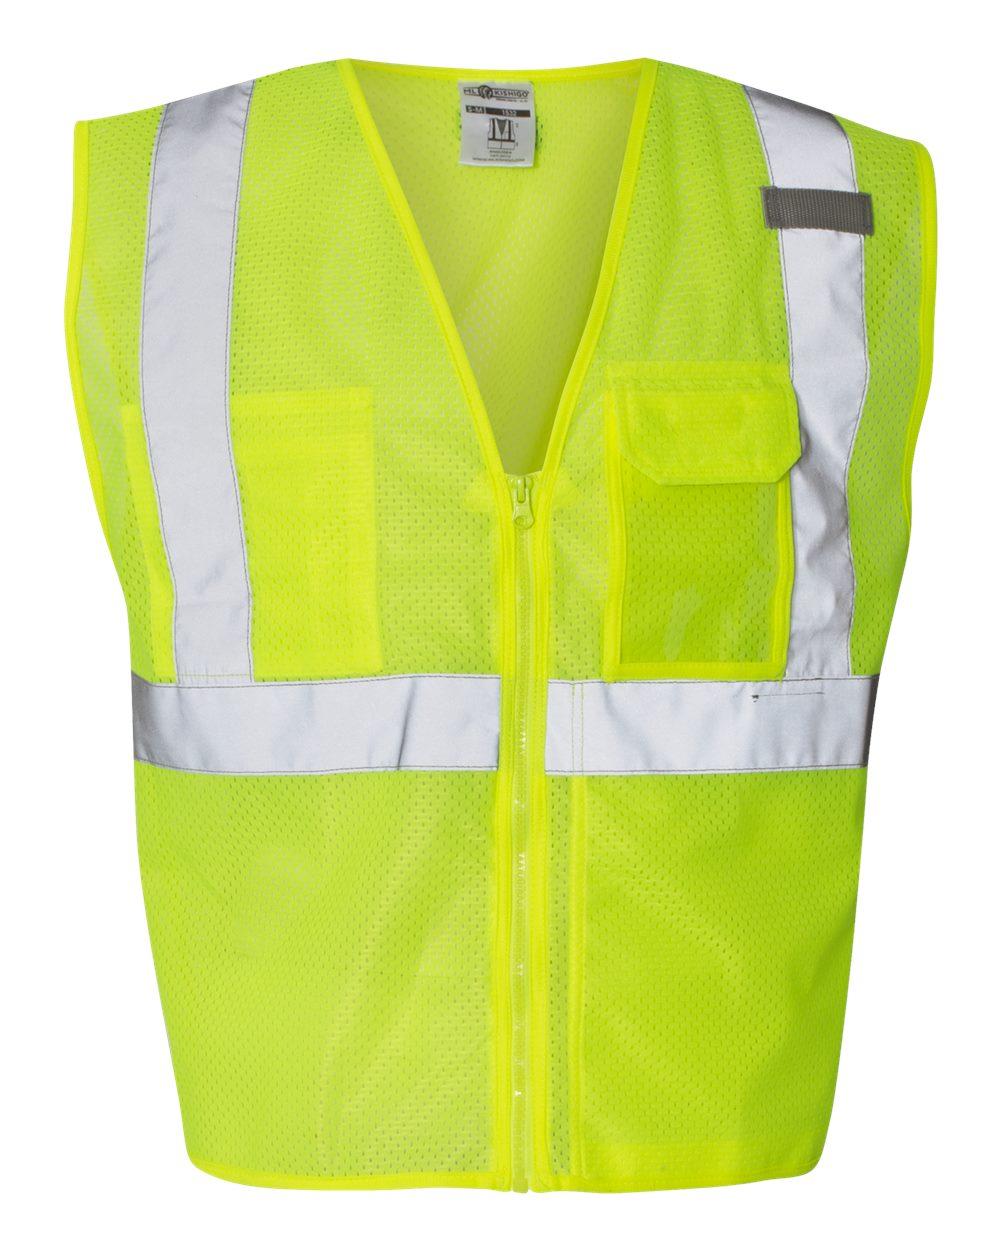 ML Kishigo - Clear ID Vest with Zipper Closure - 1532-1533